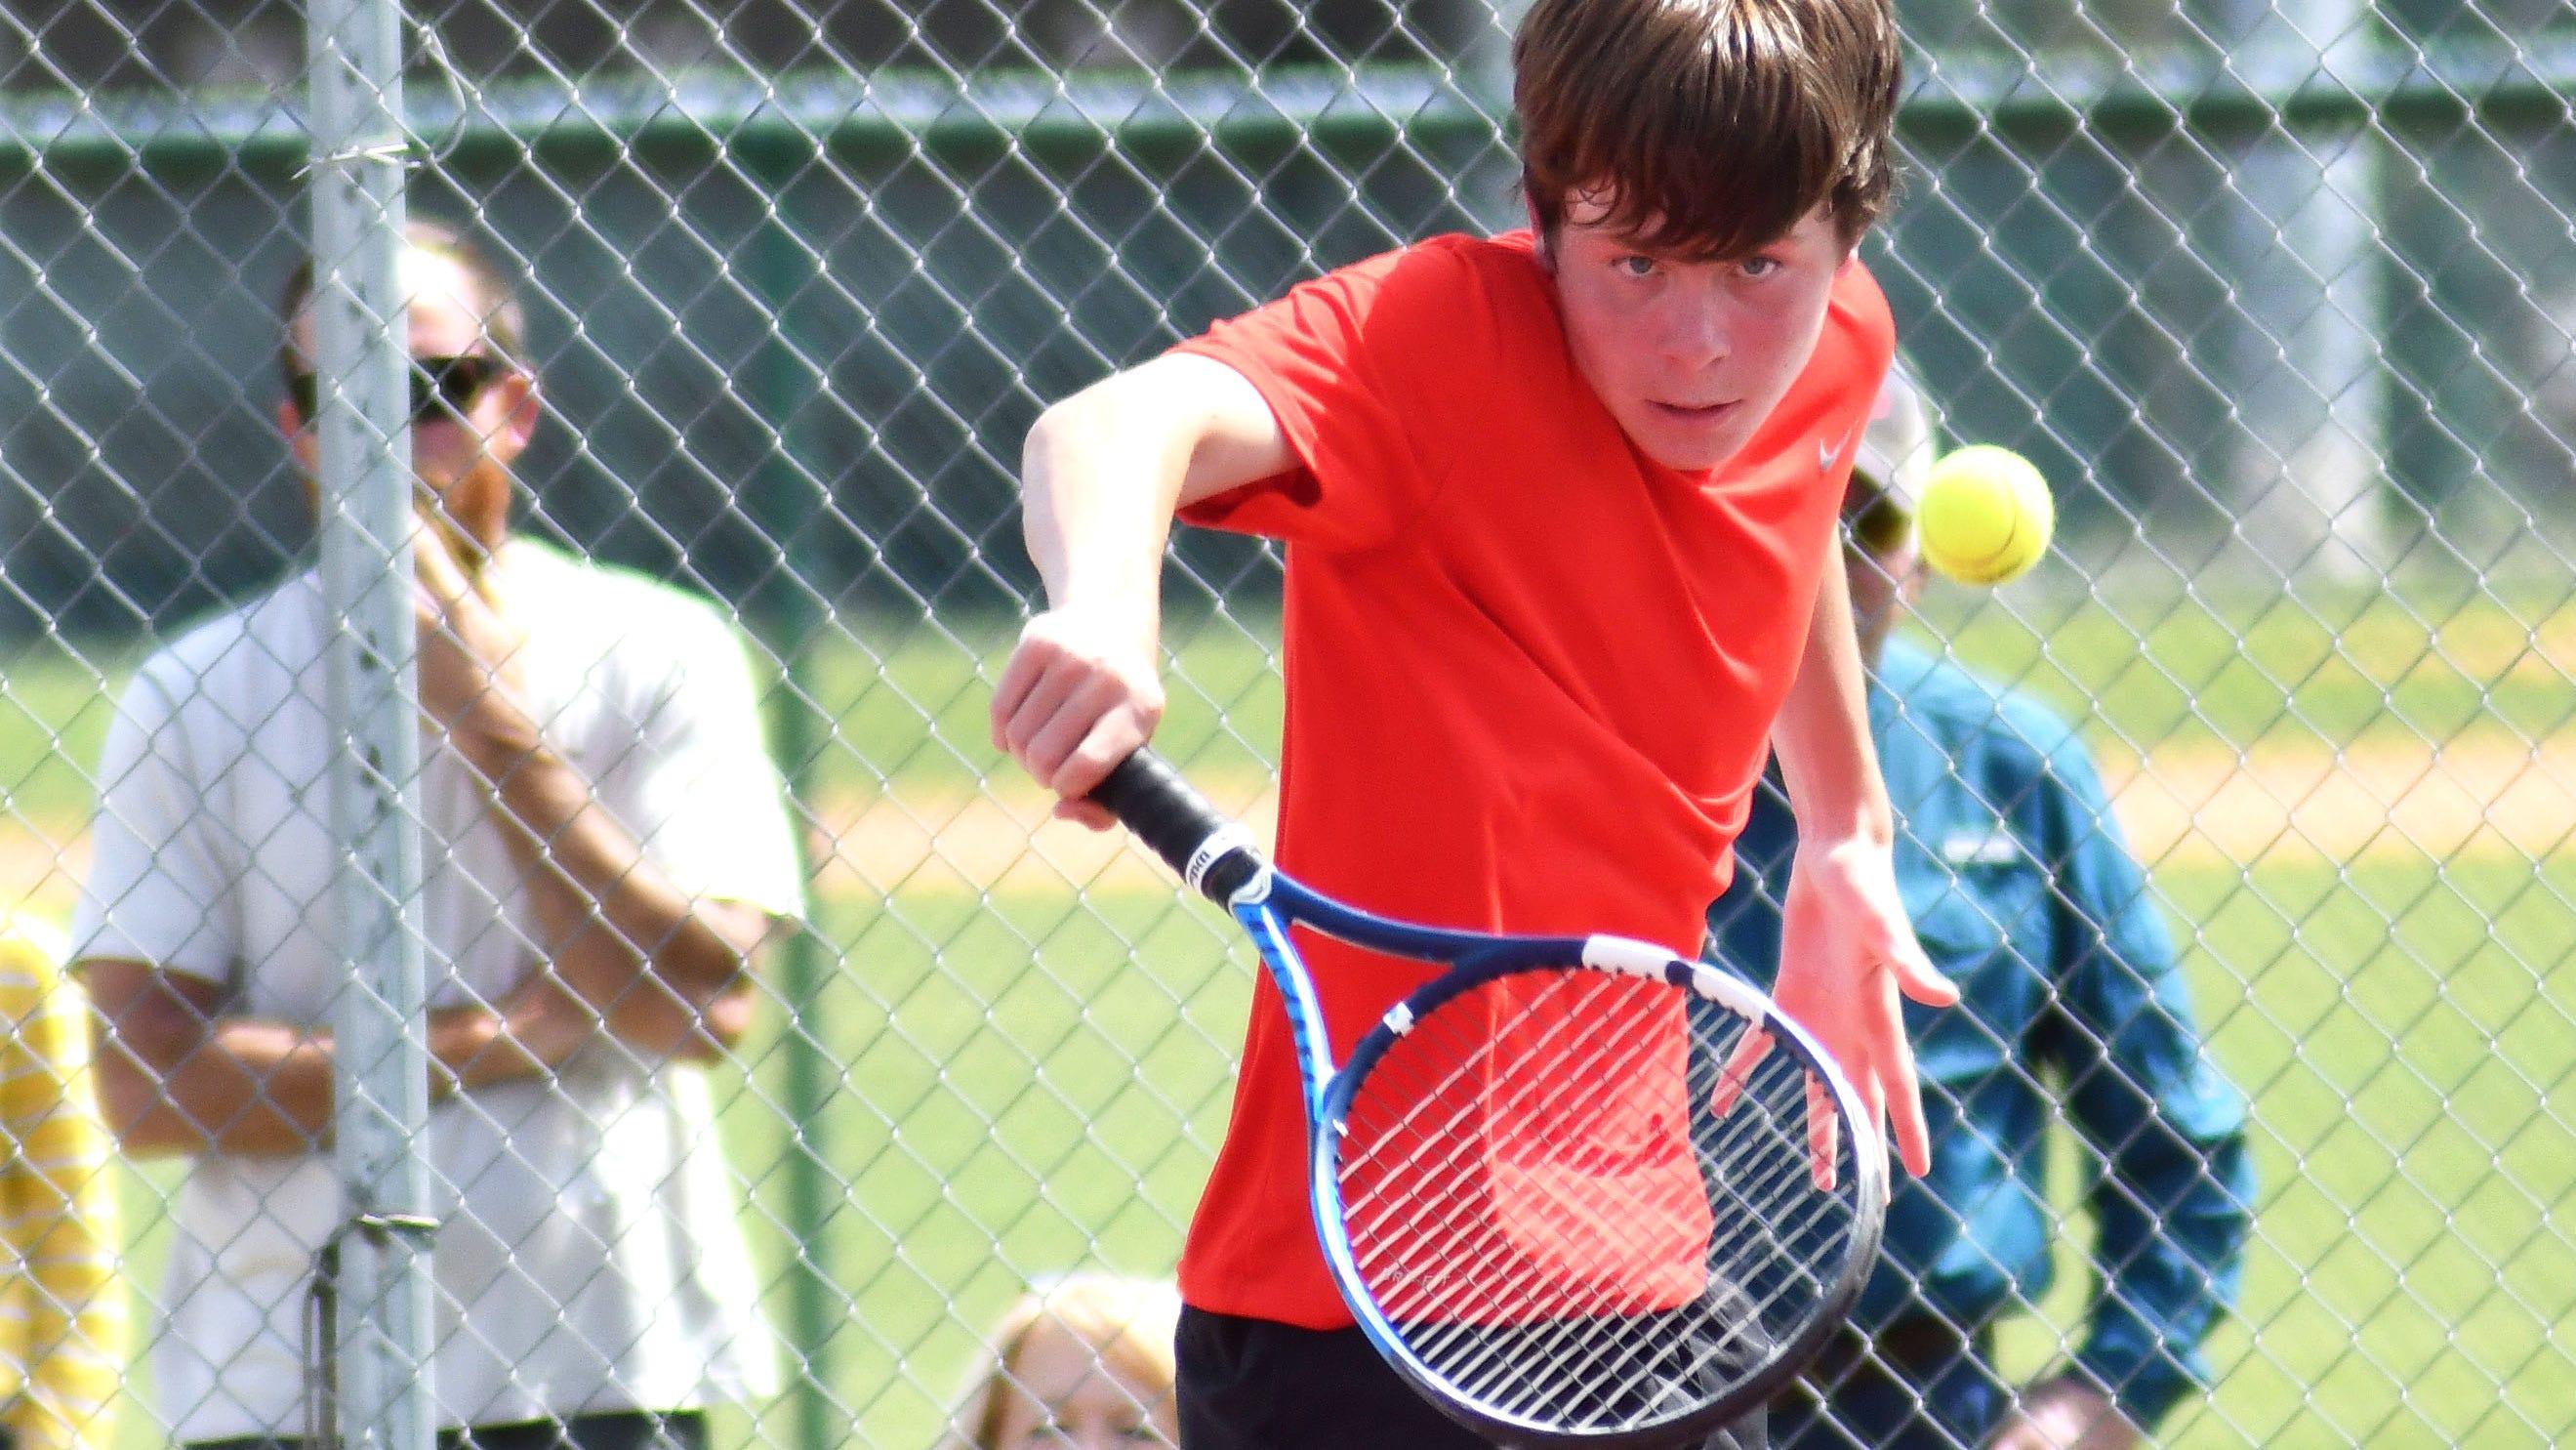 3863fcac d5a4 4d56 bcca e7eb47d08815 tennis 1 JPG?crop=2639,1485,x0,y401&width=2639&height=1485&format=pjpg&auto=webp.